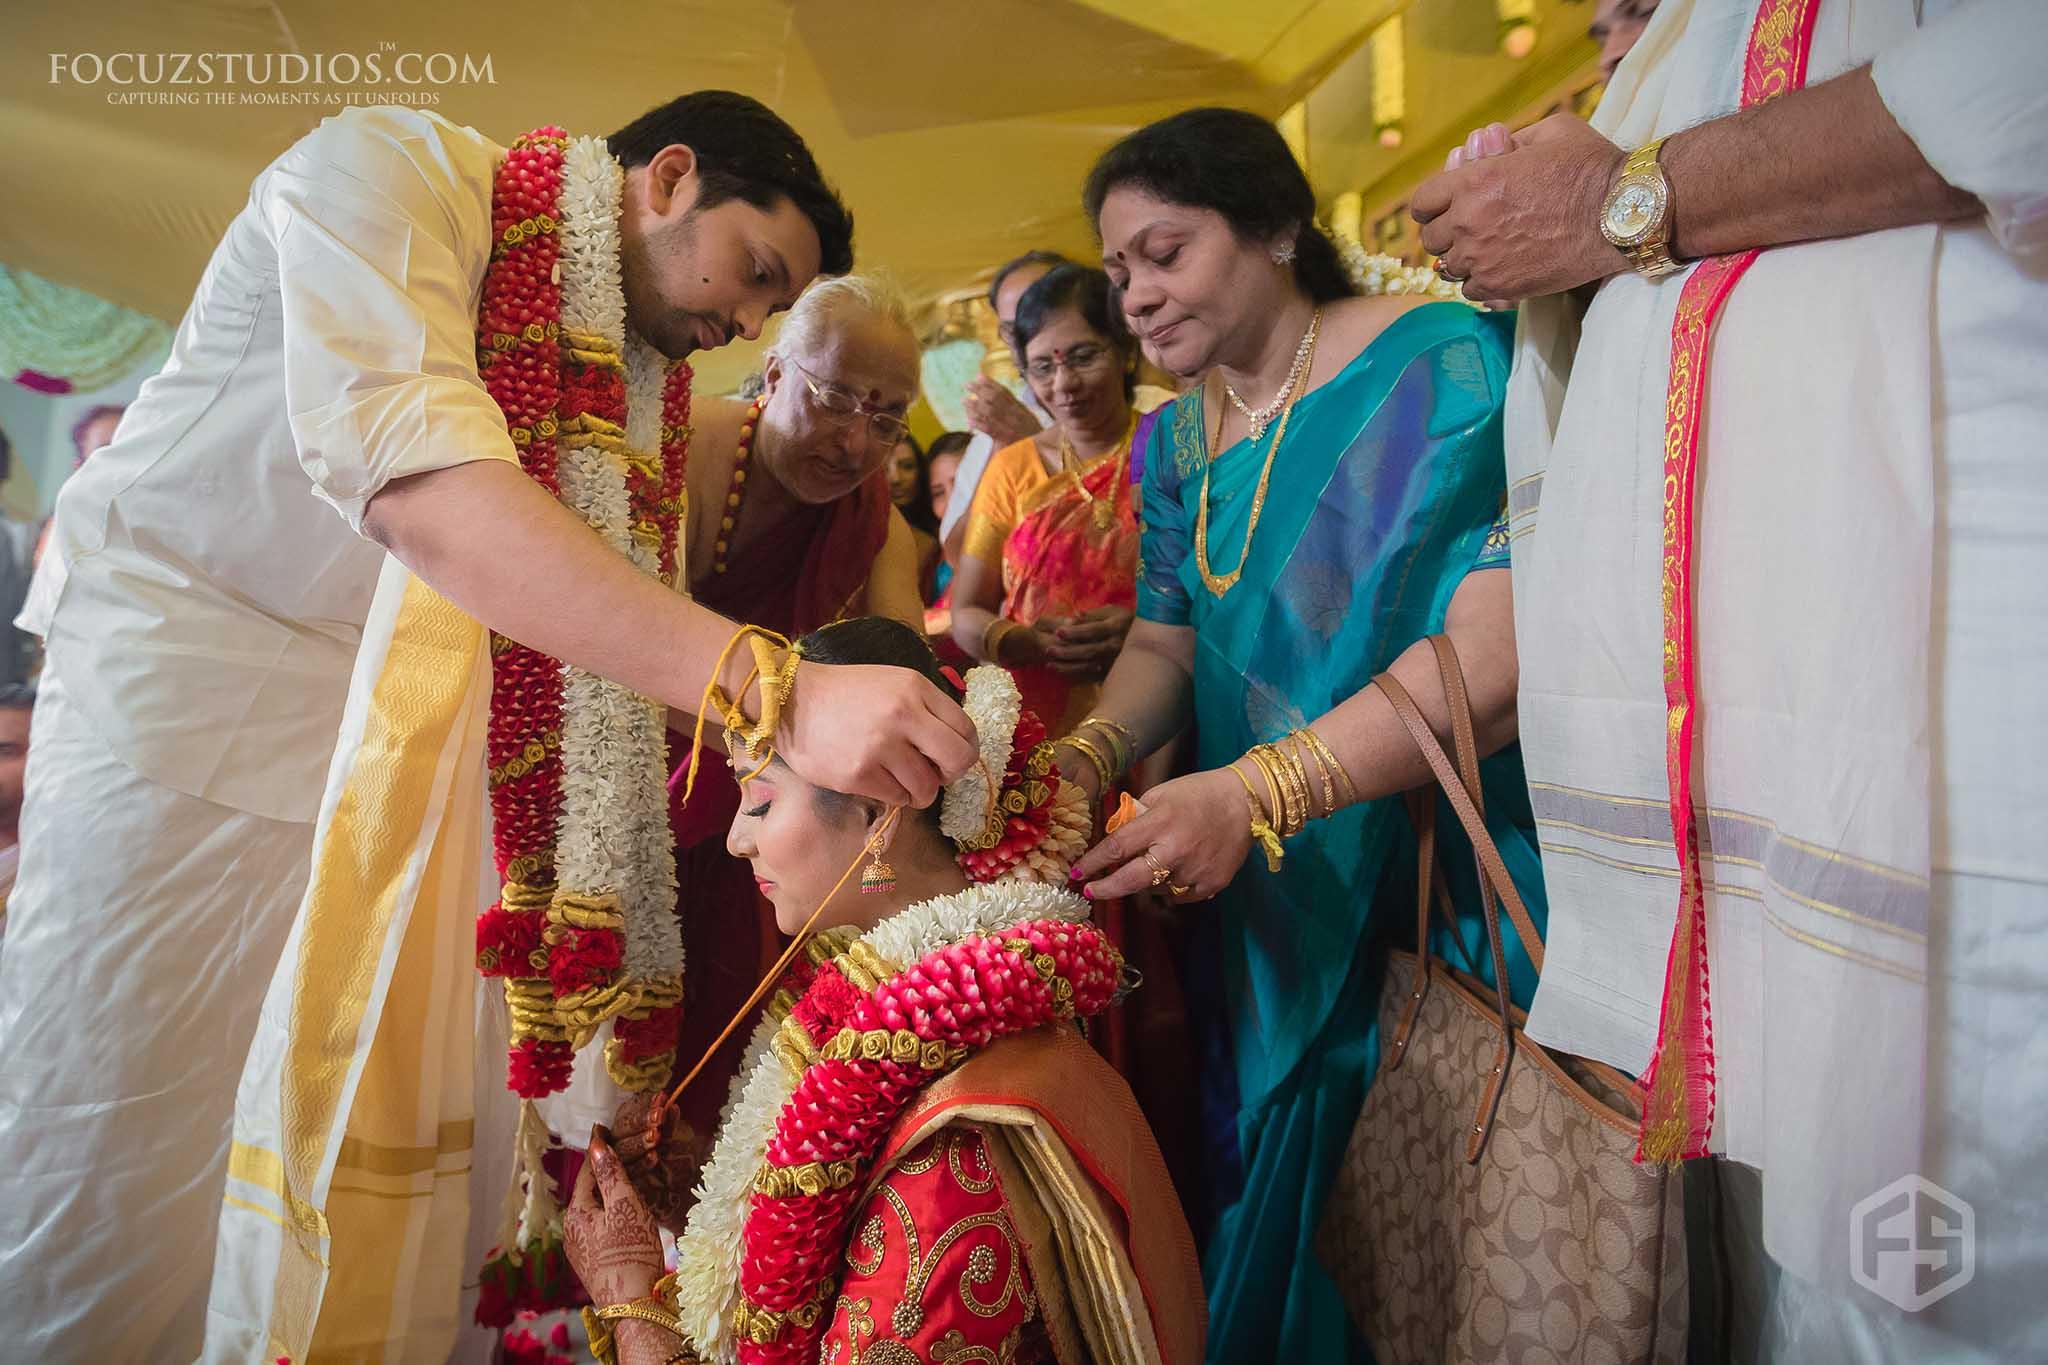 naidu-wedding-rituals-photography-chennai-9